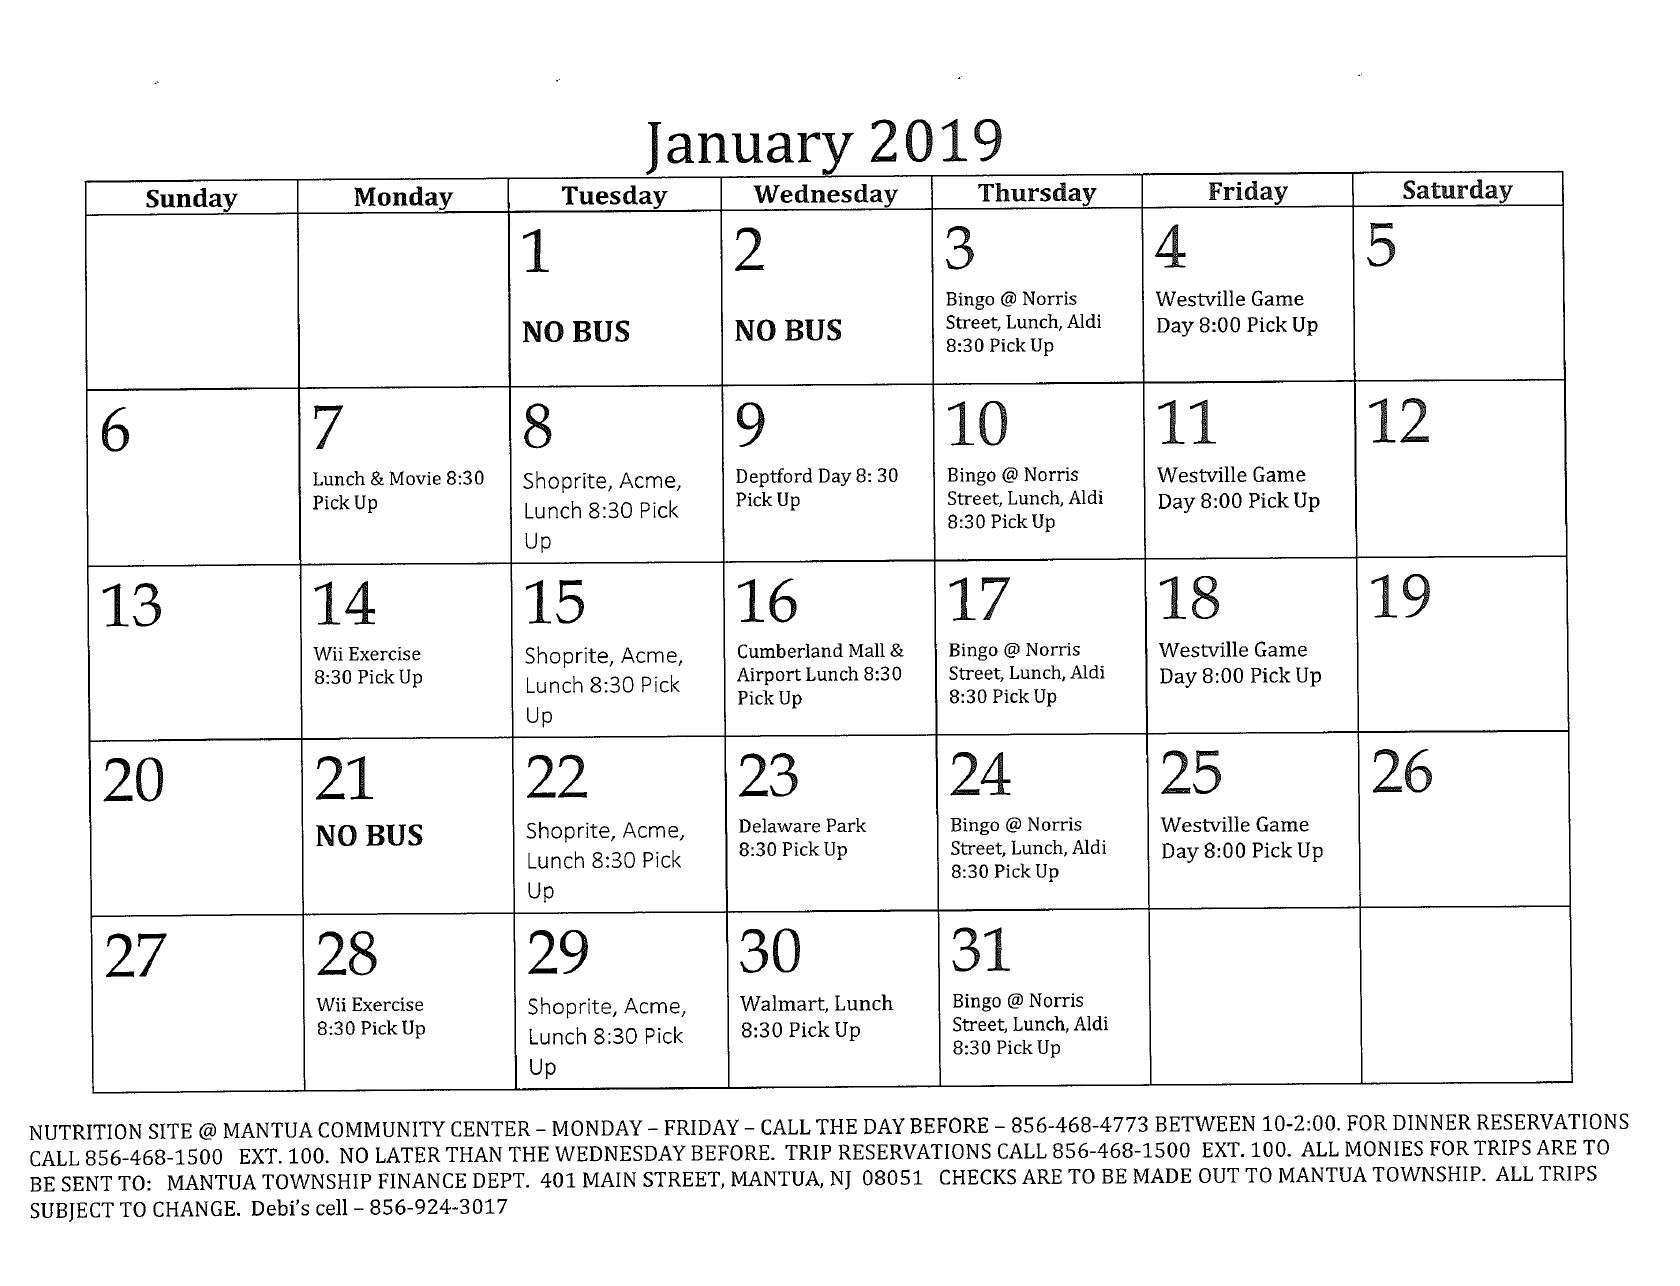 January Senior Calendar - Mantua Township Content Calendar For Member Newsletters